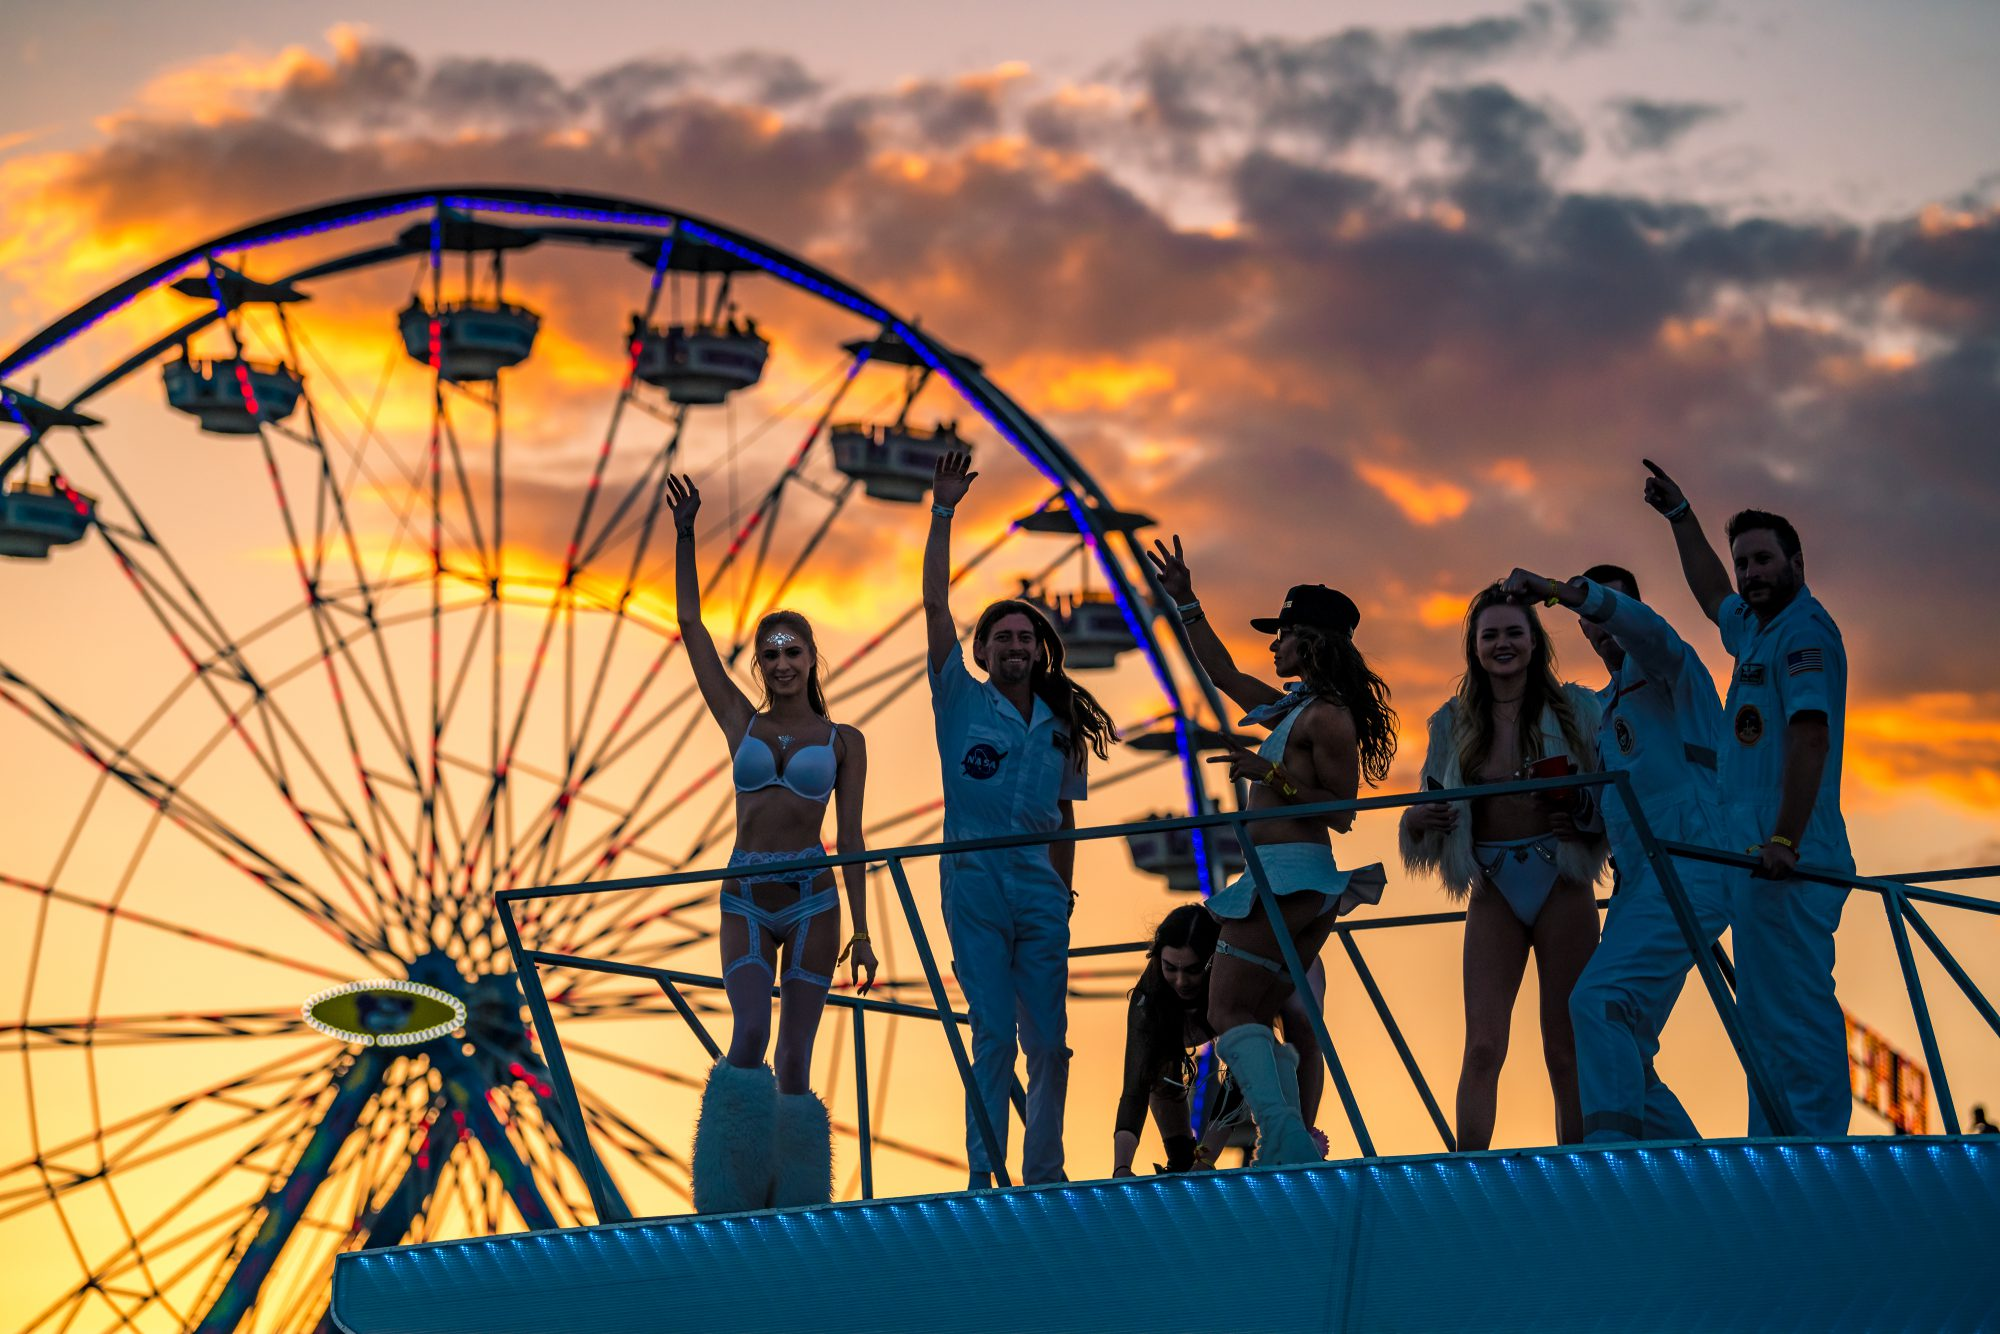 EDC Las Vegas 2018 Ferris Wheel Sunset